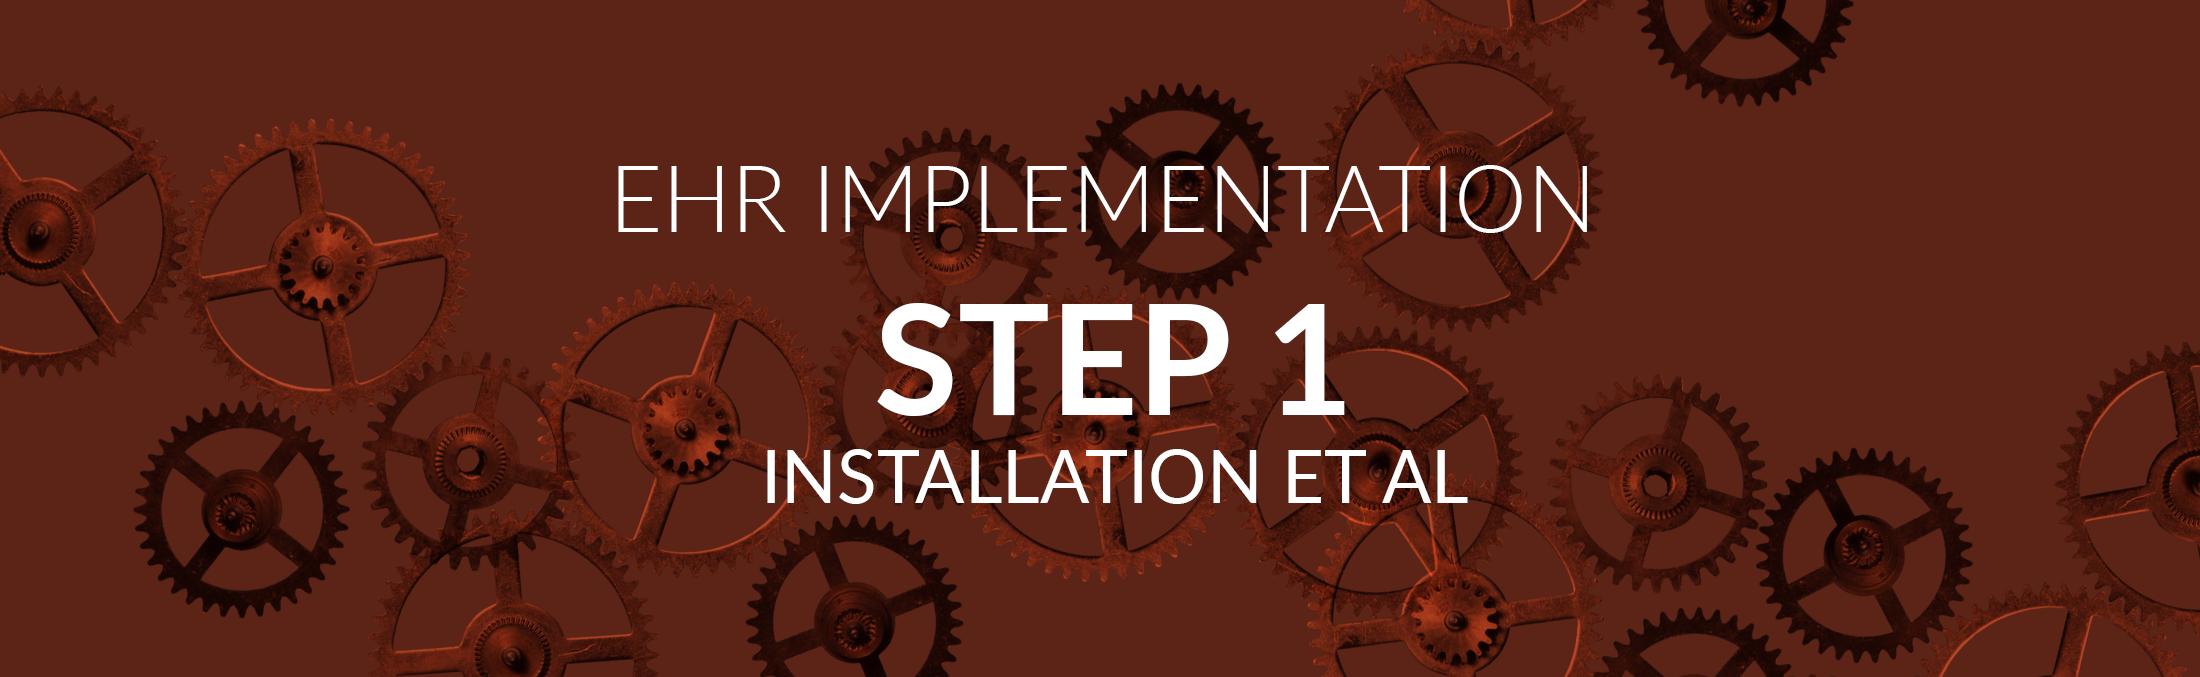 EHR implementation step 1